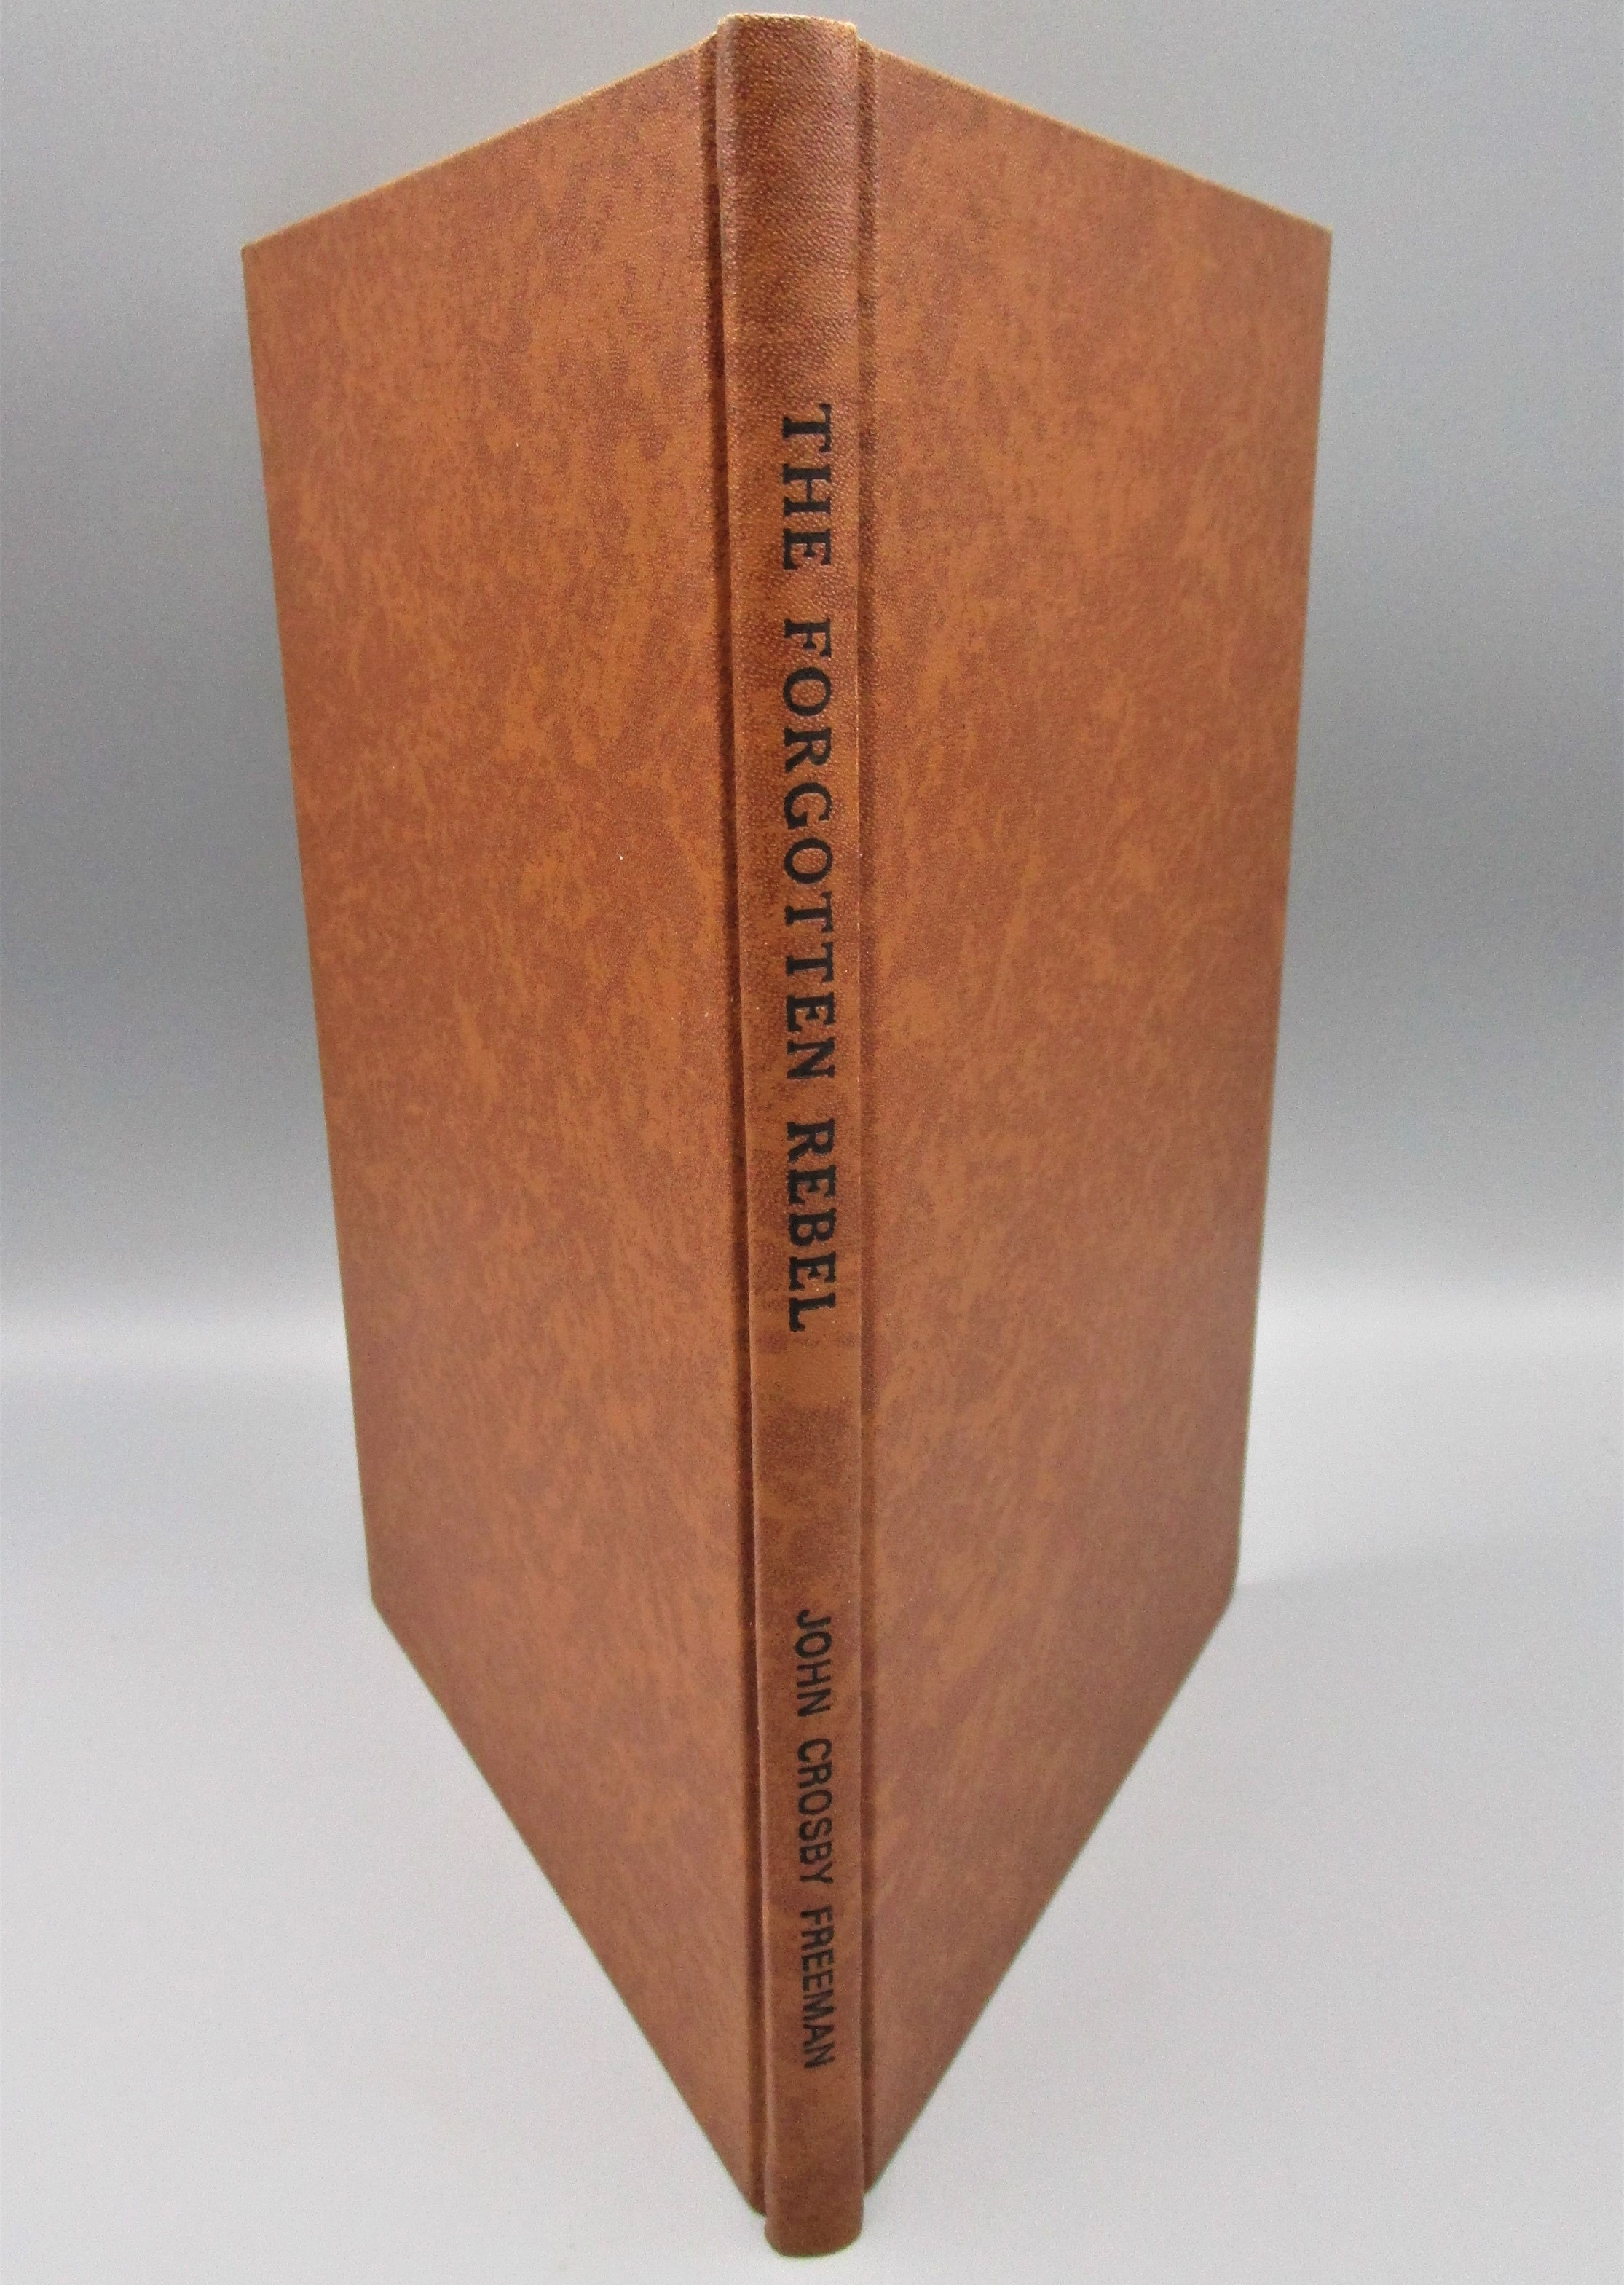 FORGOTTEN REBEL: GUSTAV STICKLEY, by John C. Freeman - 1966